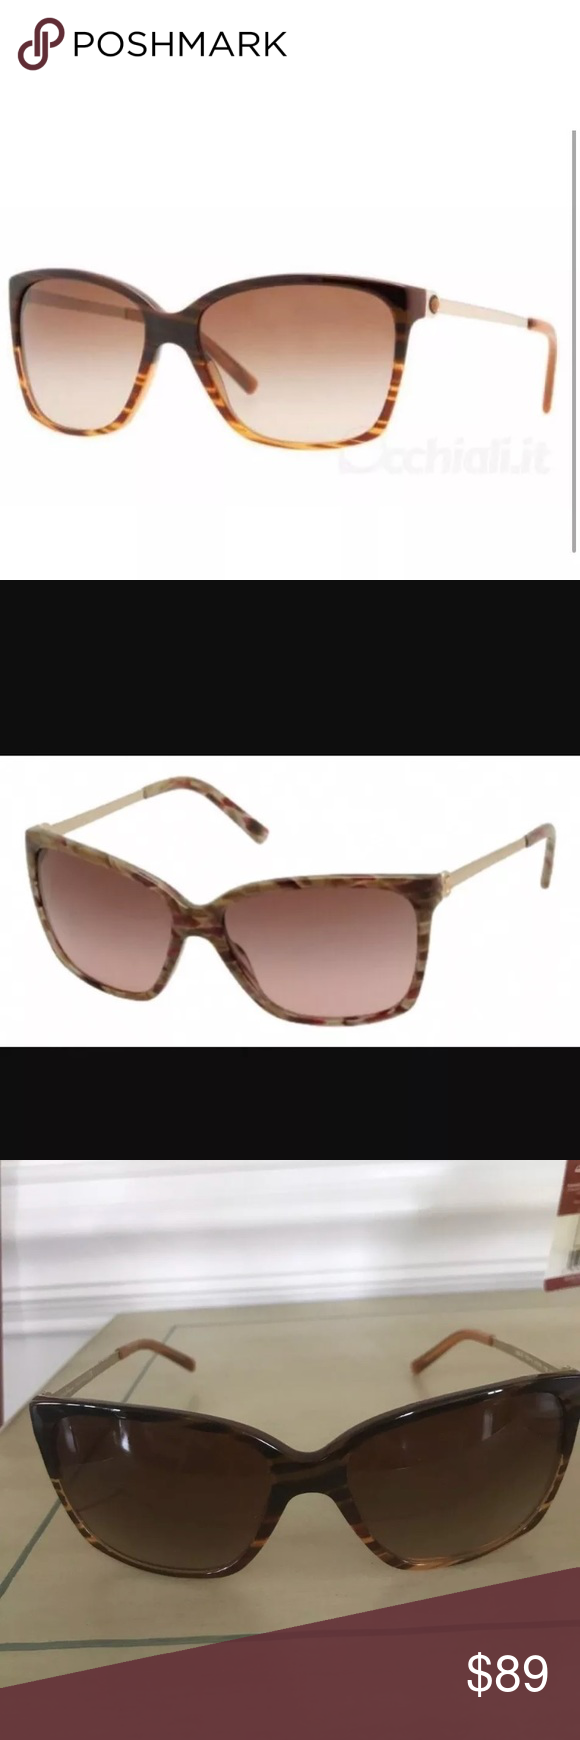 95eba430b6 Ferragamo cat eye sunglasses new boho summer Brand new sunglasses